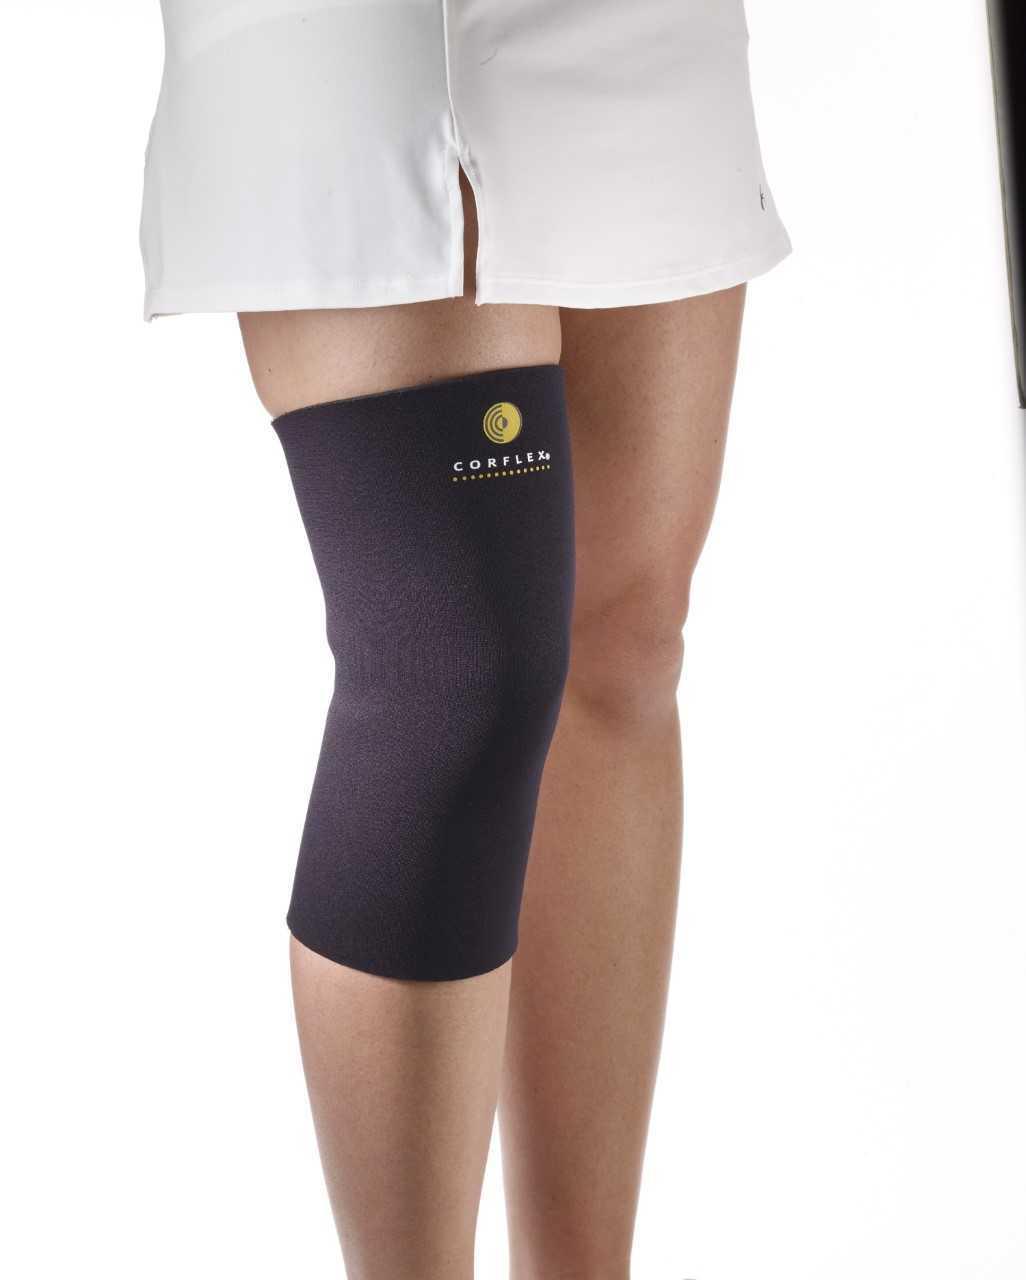 "Corflex Neoprene Compression Knee Sleeve 3/16"" Black - Small - $21.99"